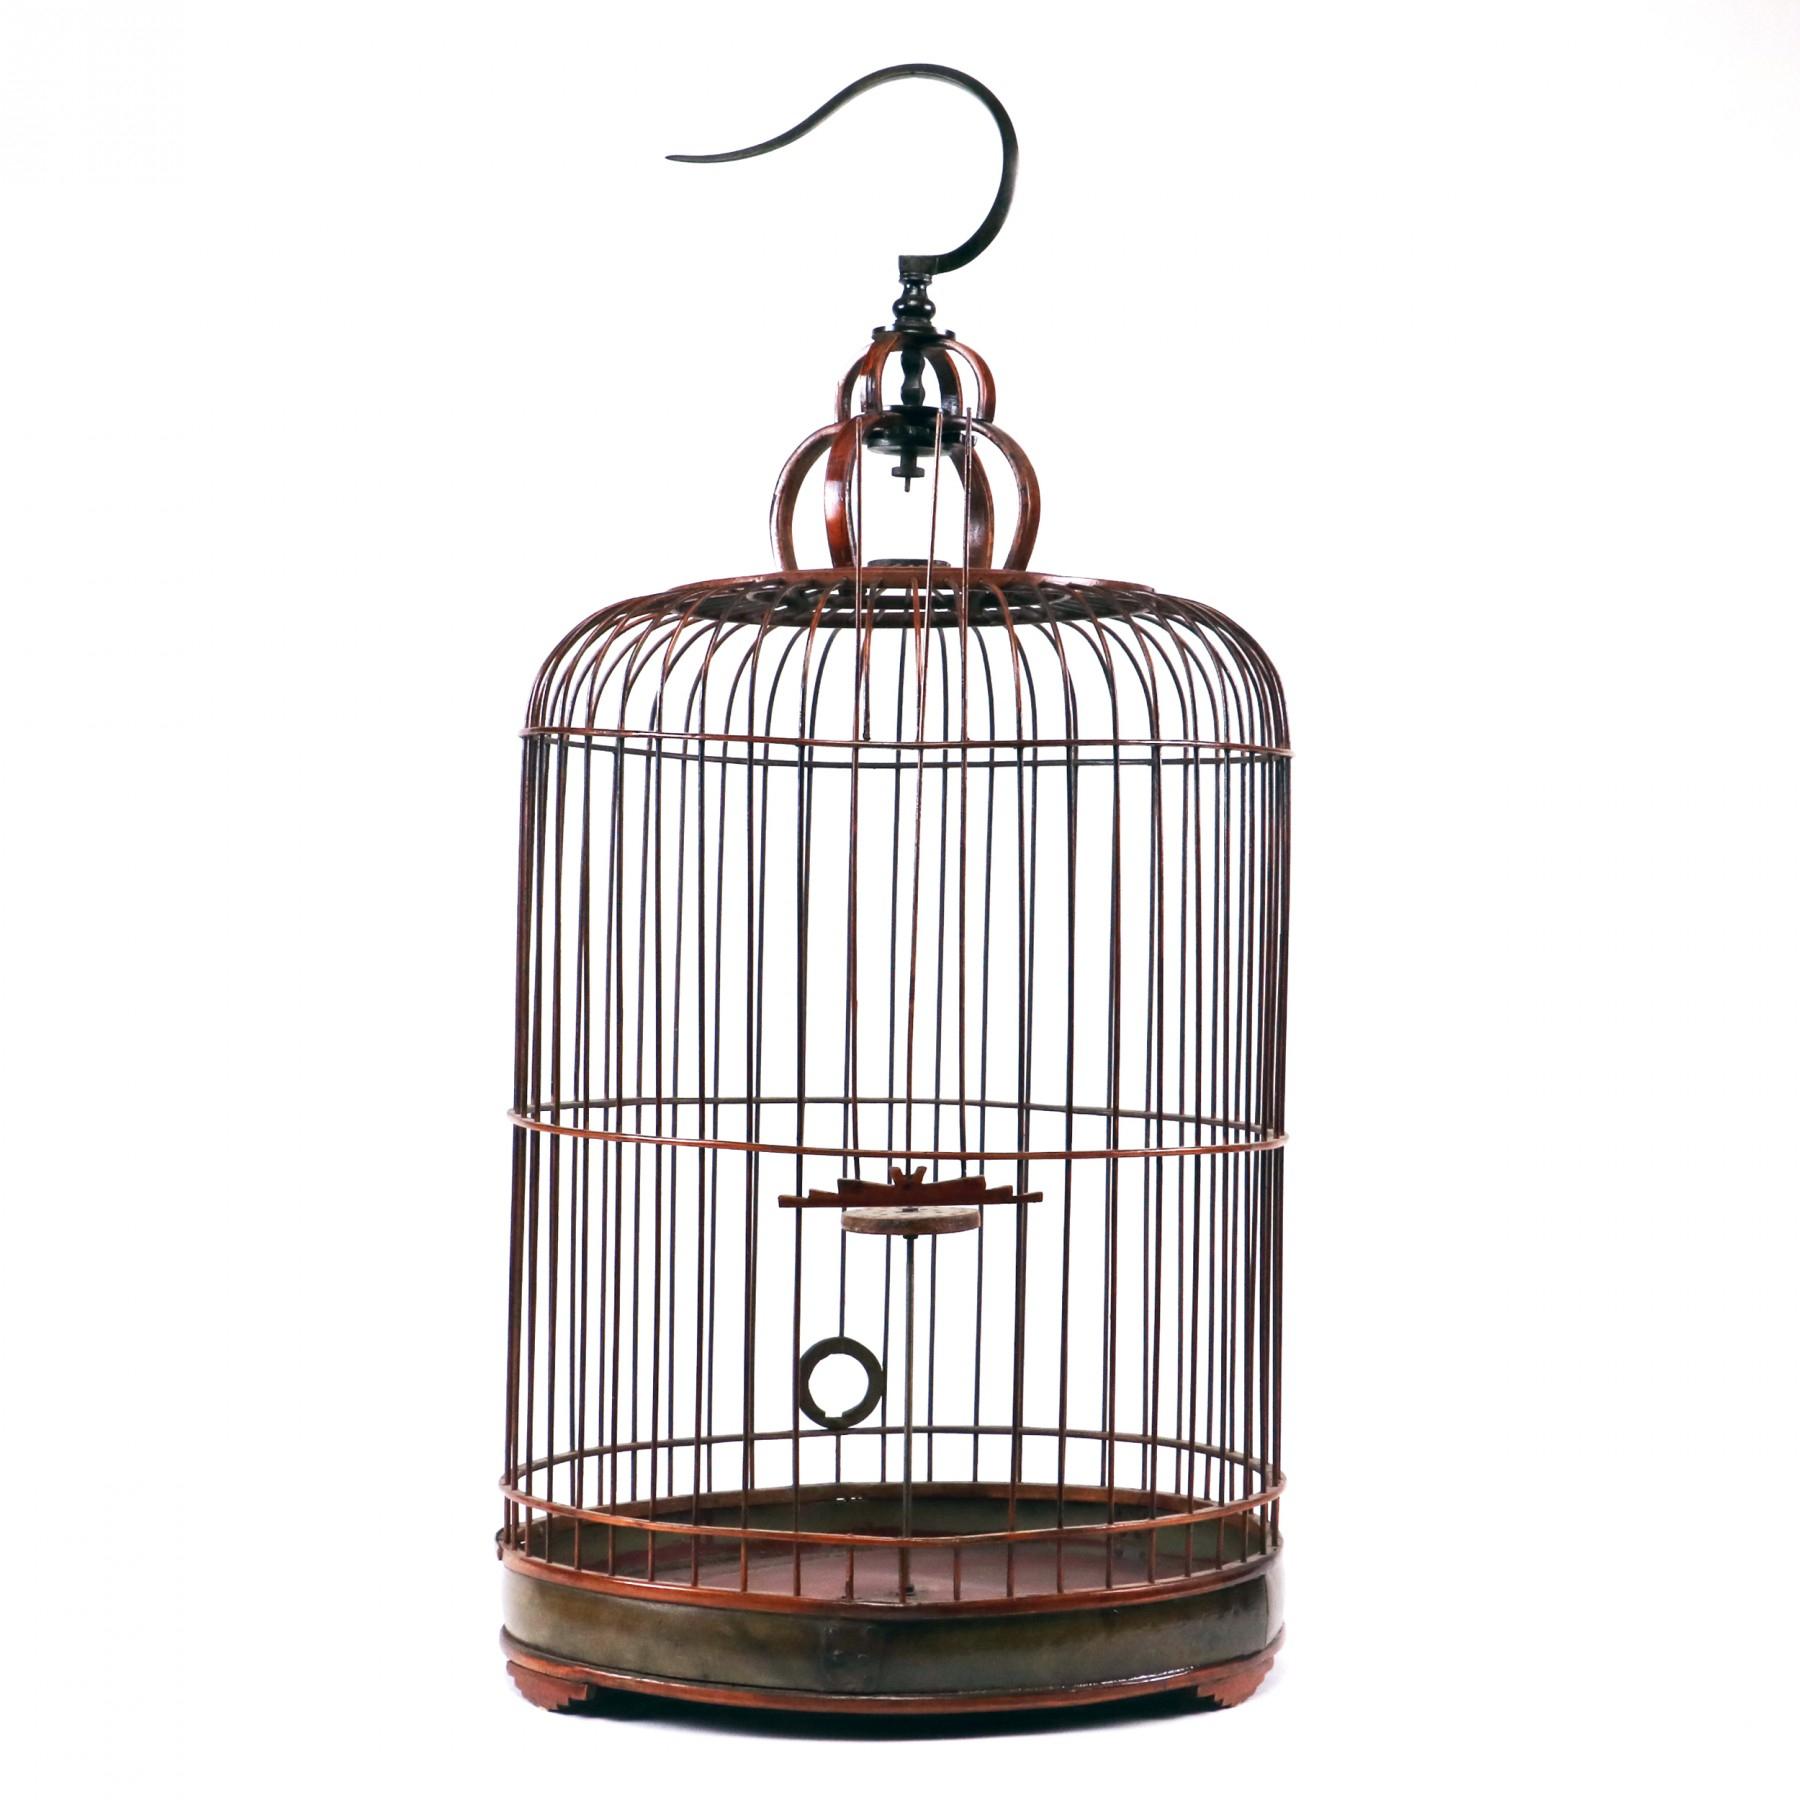 Chinese Bird Cage concernant Dessin De Cage D Oiseau